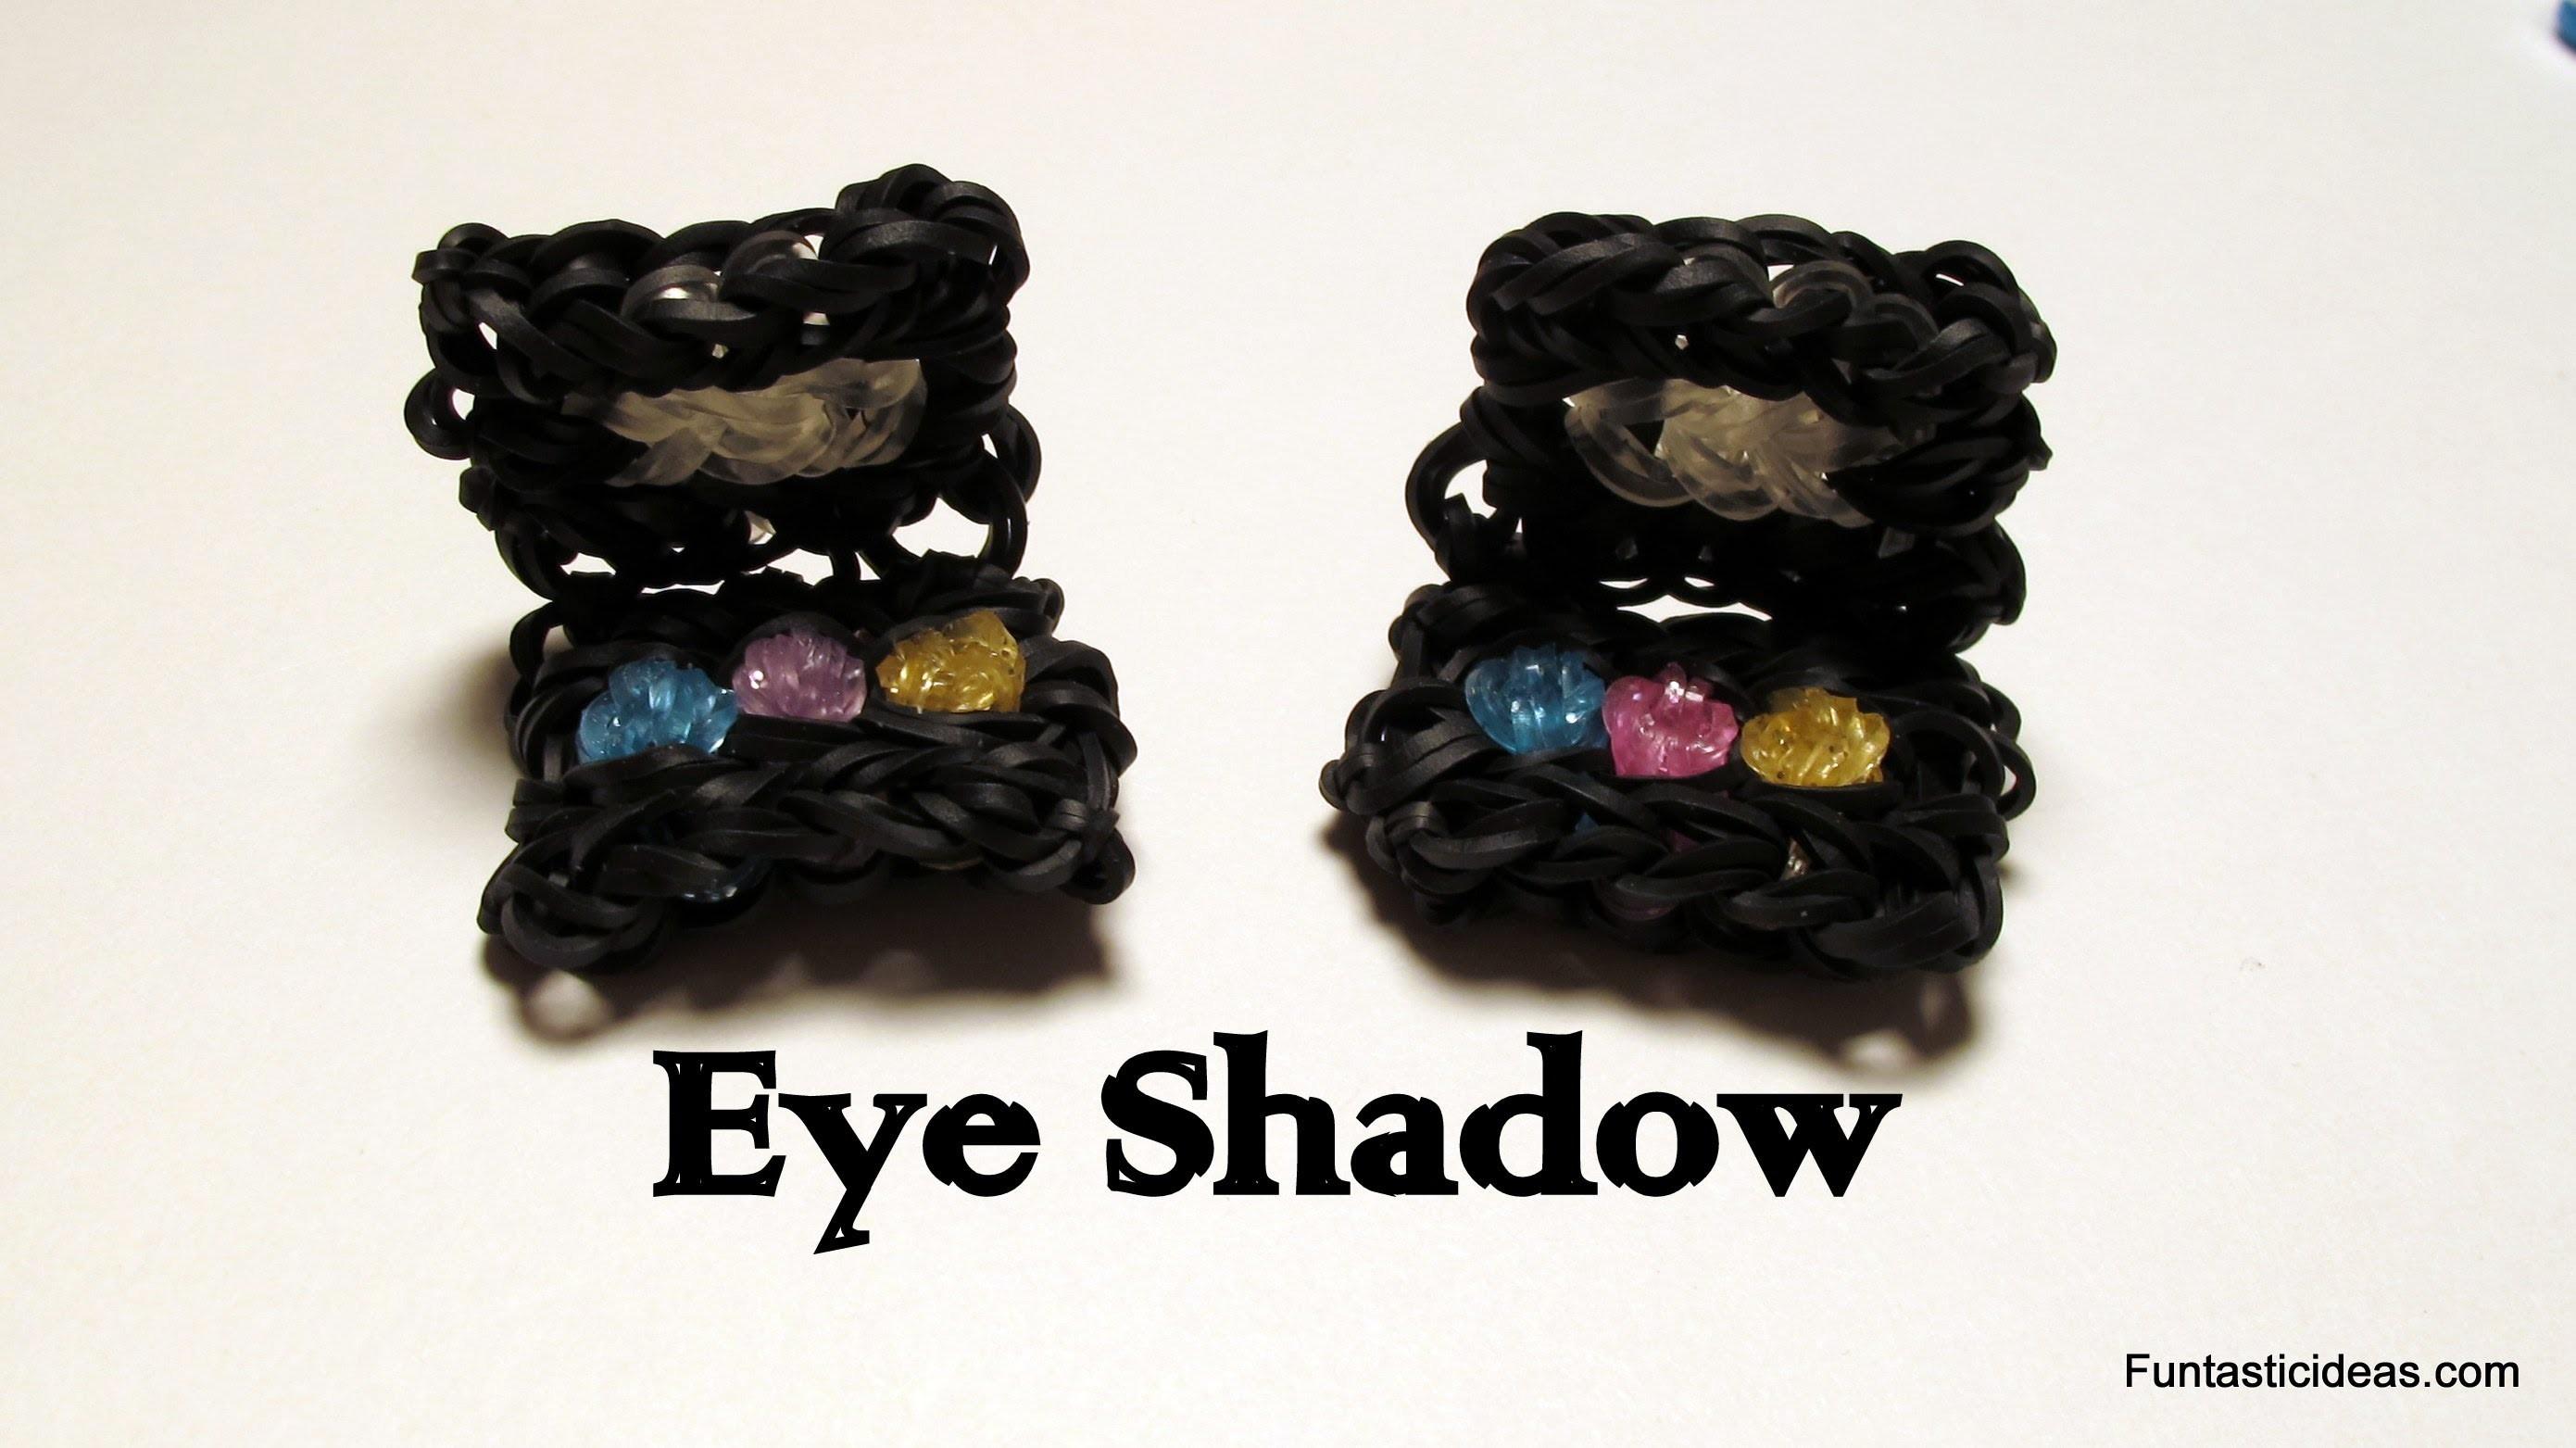 Rainbow Loom Makeup Palette.Eye Shadow Charm- How to - Make Up Series